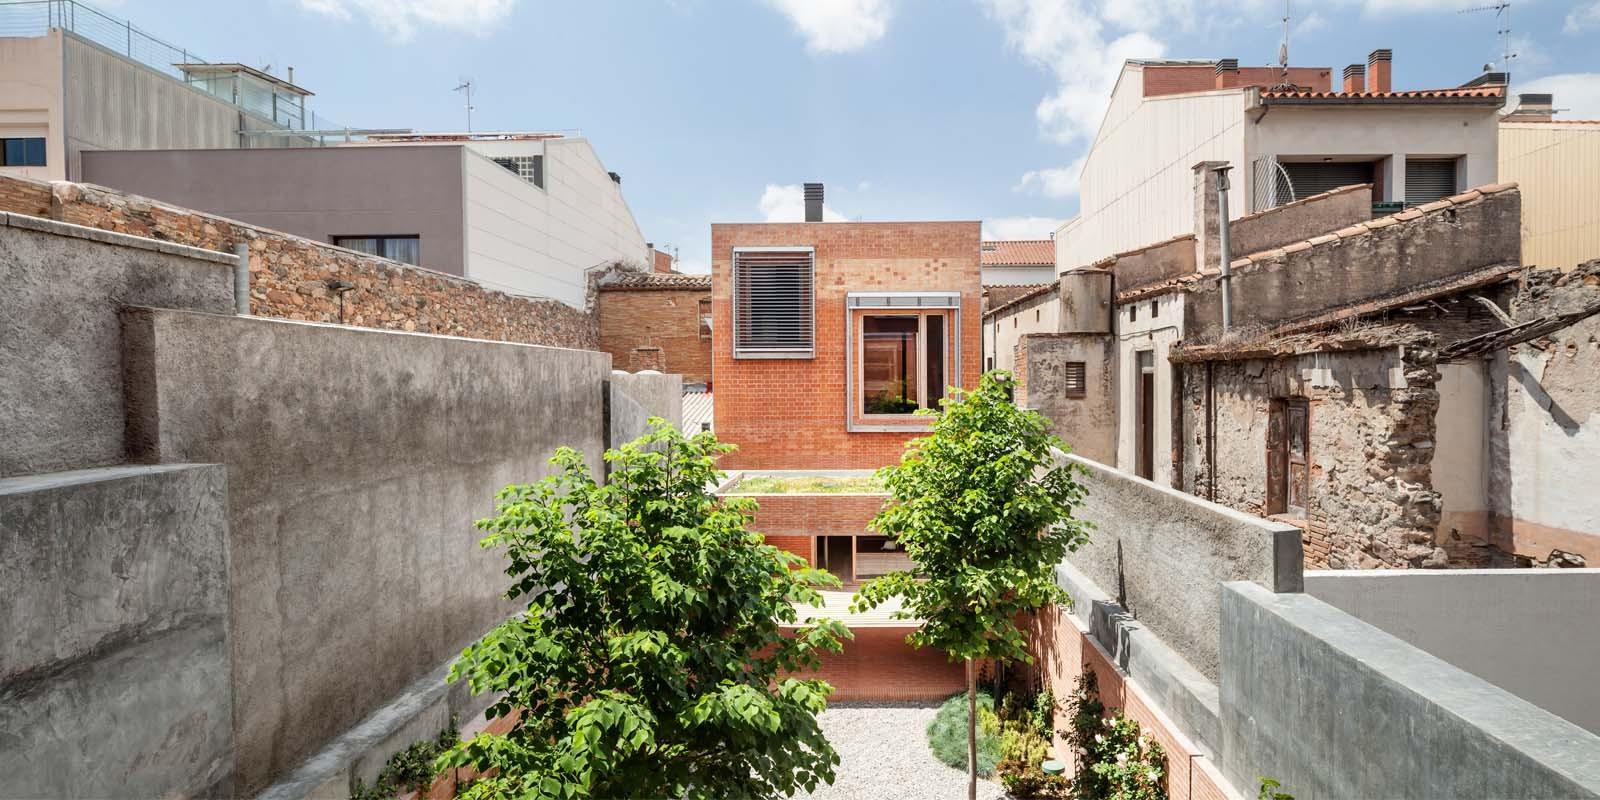 Casa 1014 / H Arquitectes, © Adrià Goula